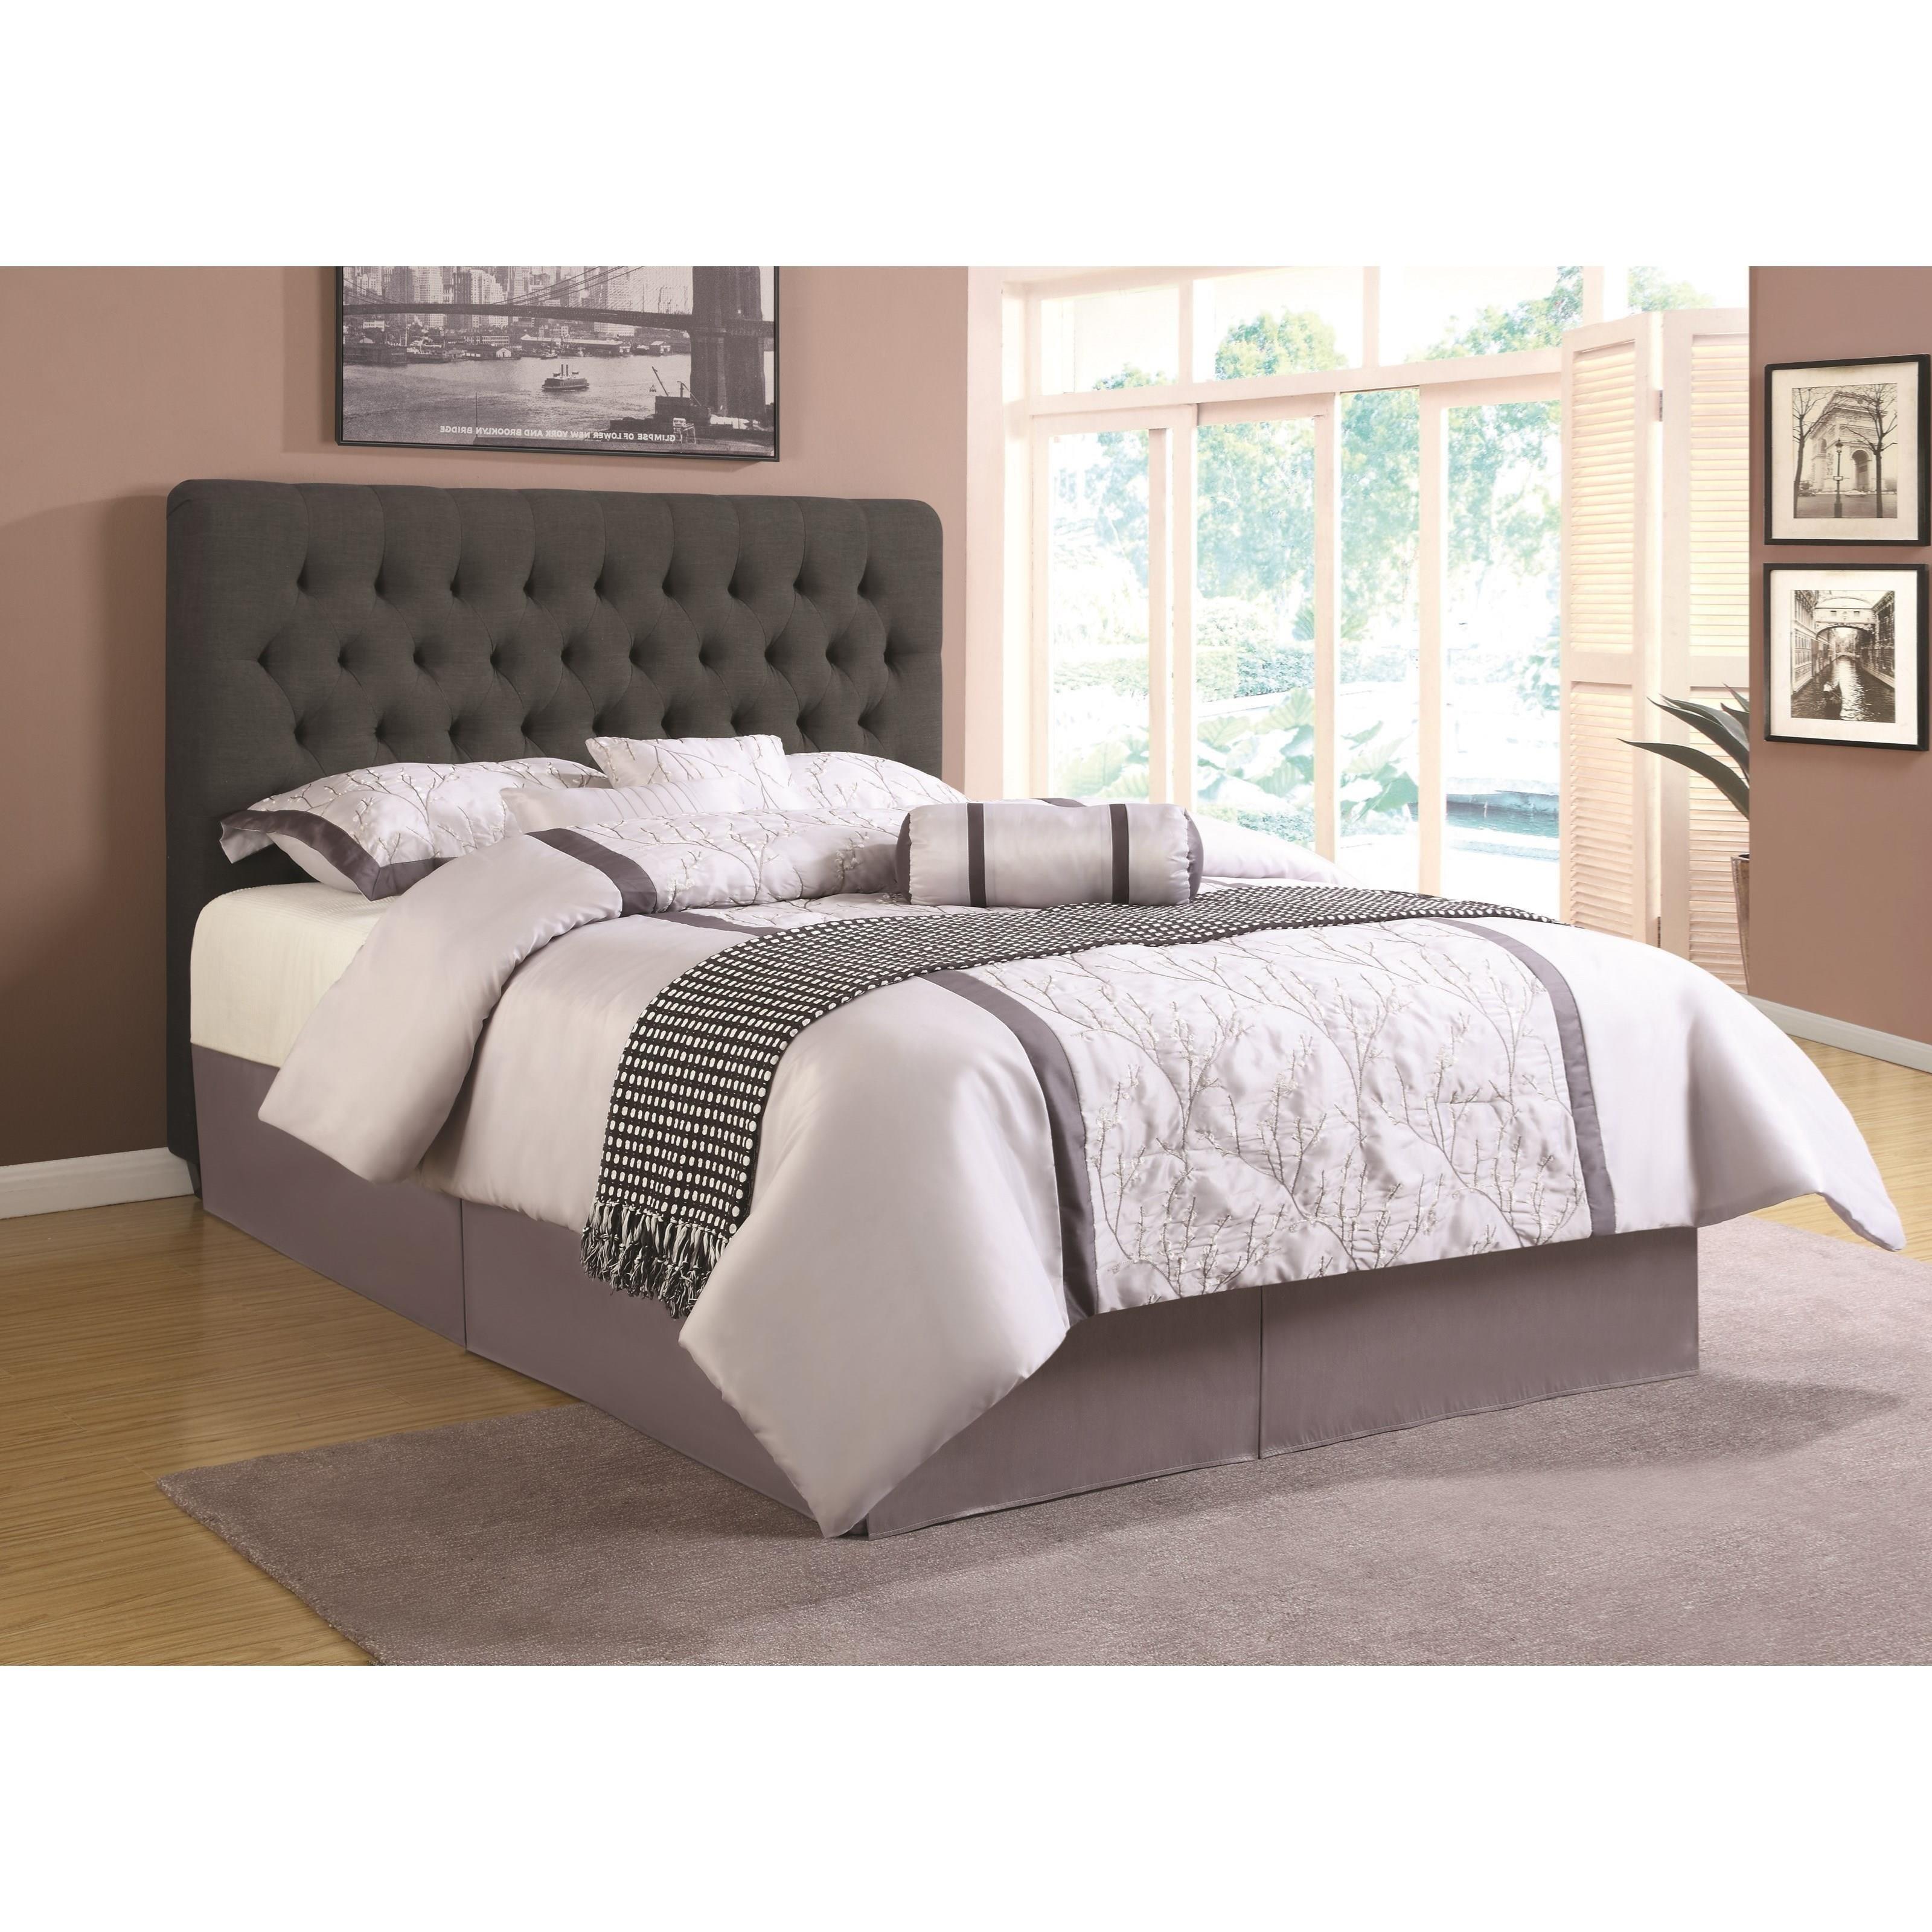 Coaster Upholstered Beds Full Headboard - Item Number: 300529FB1